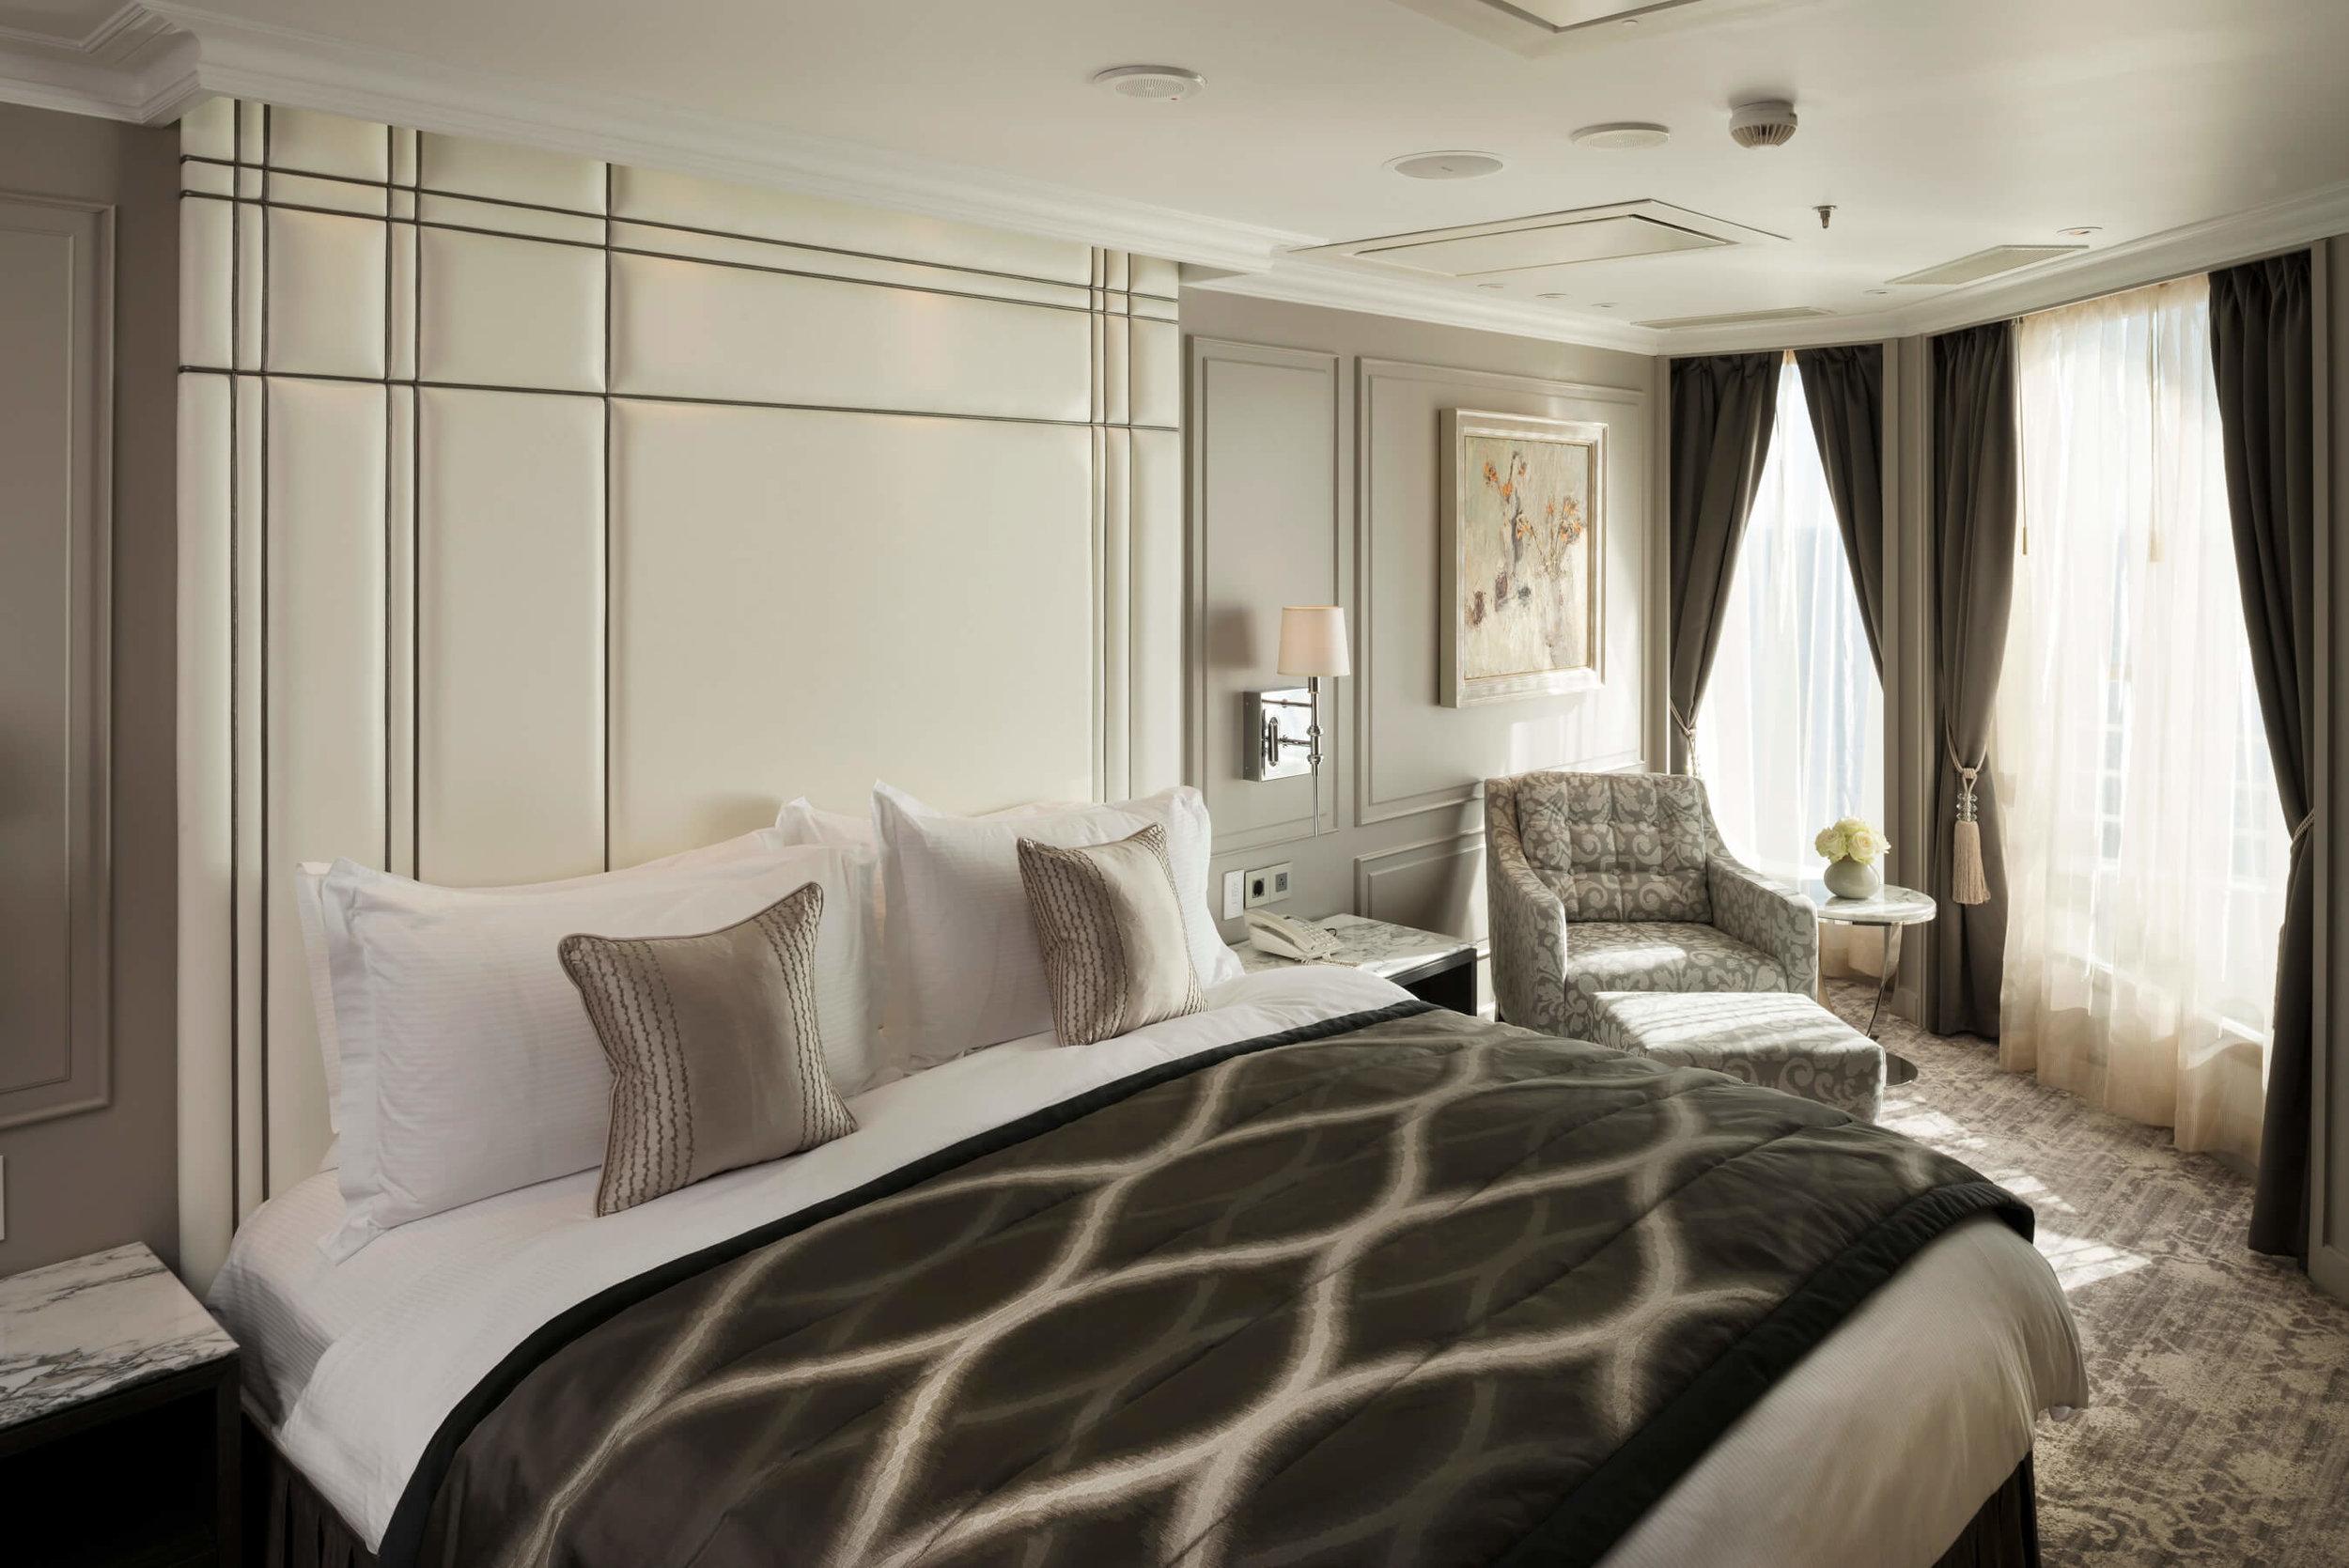 Luxury Reimagined - Crystal Penthouse with Veranda